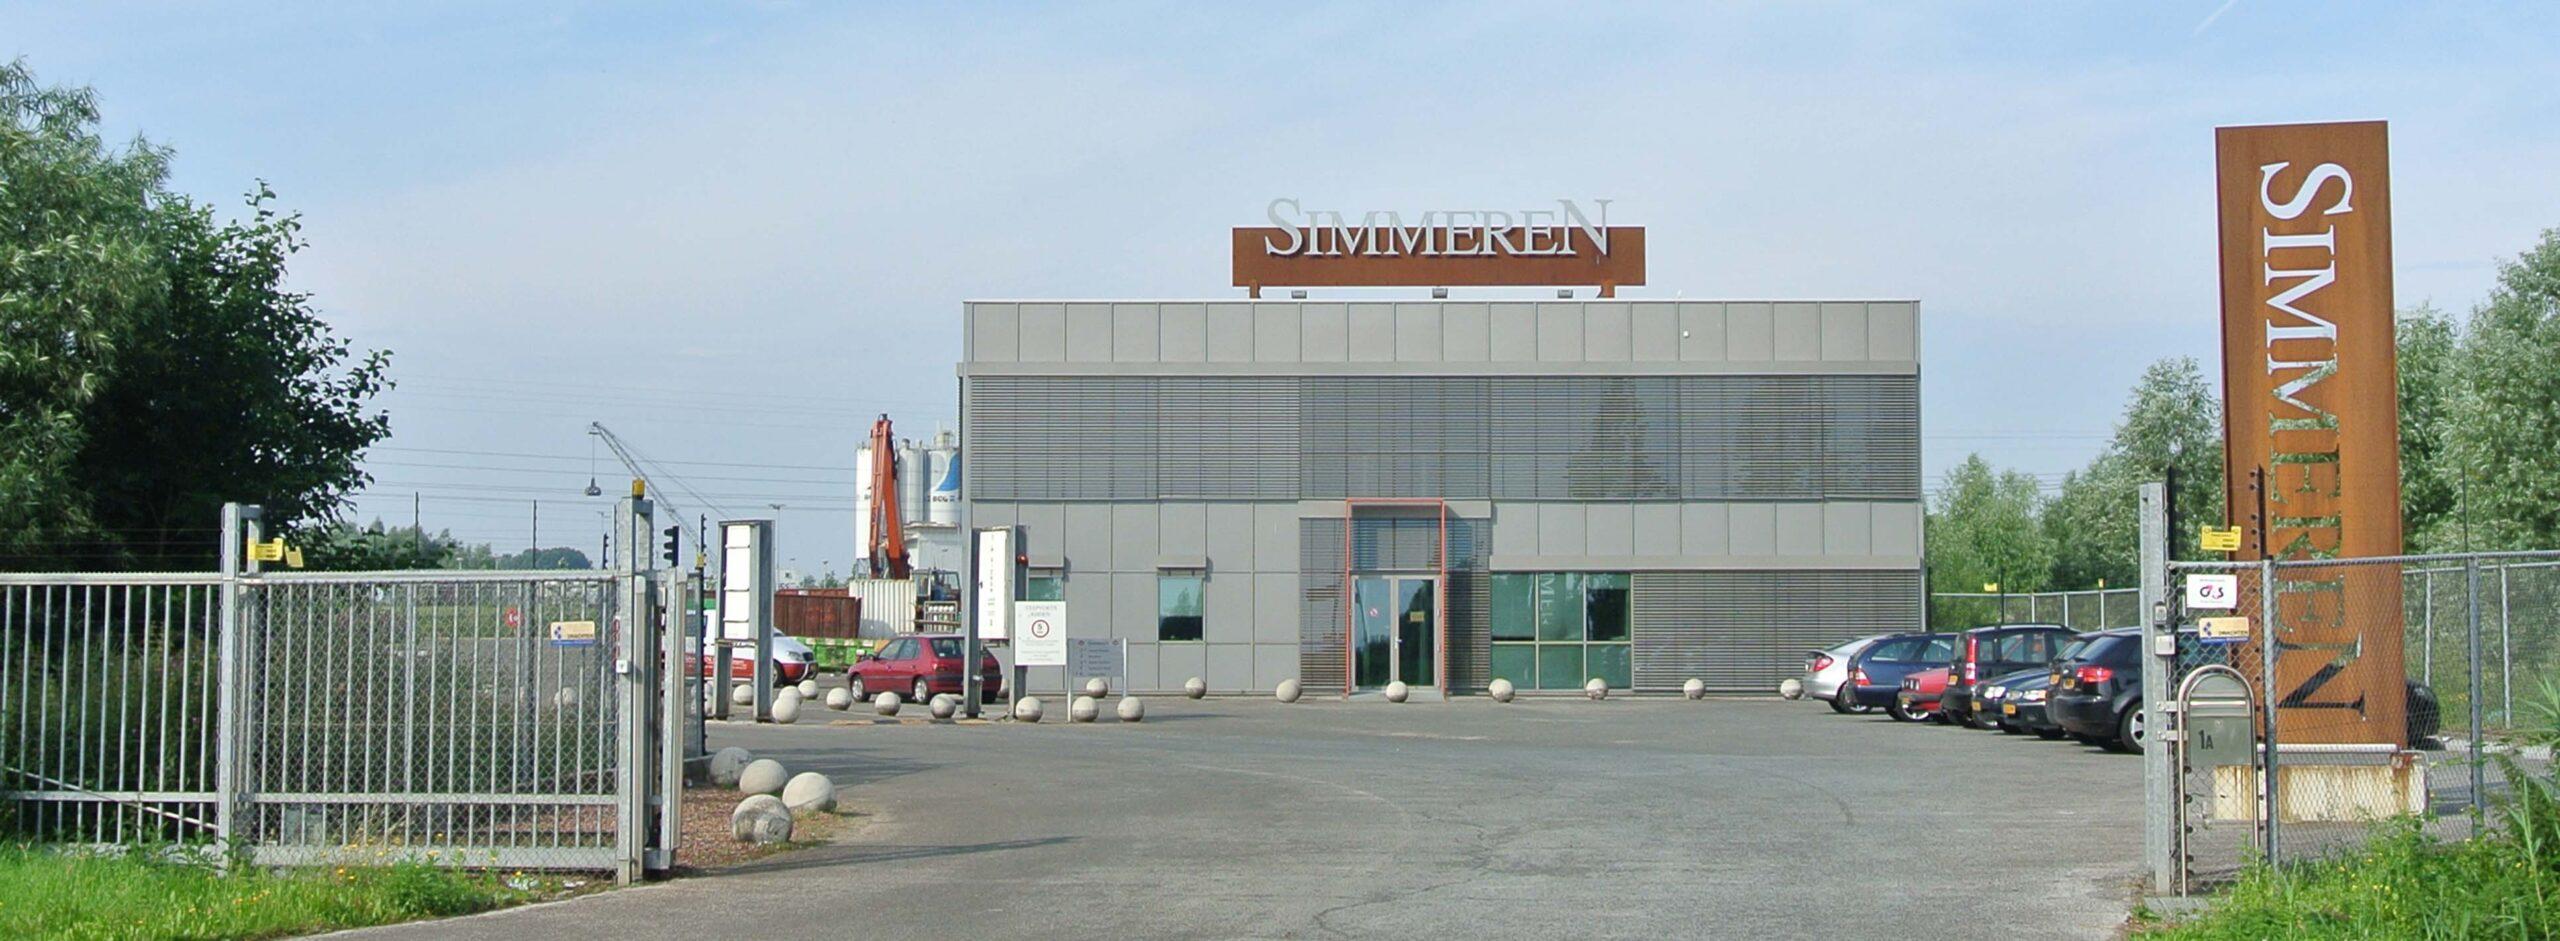 hoofdingang SimmereN